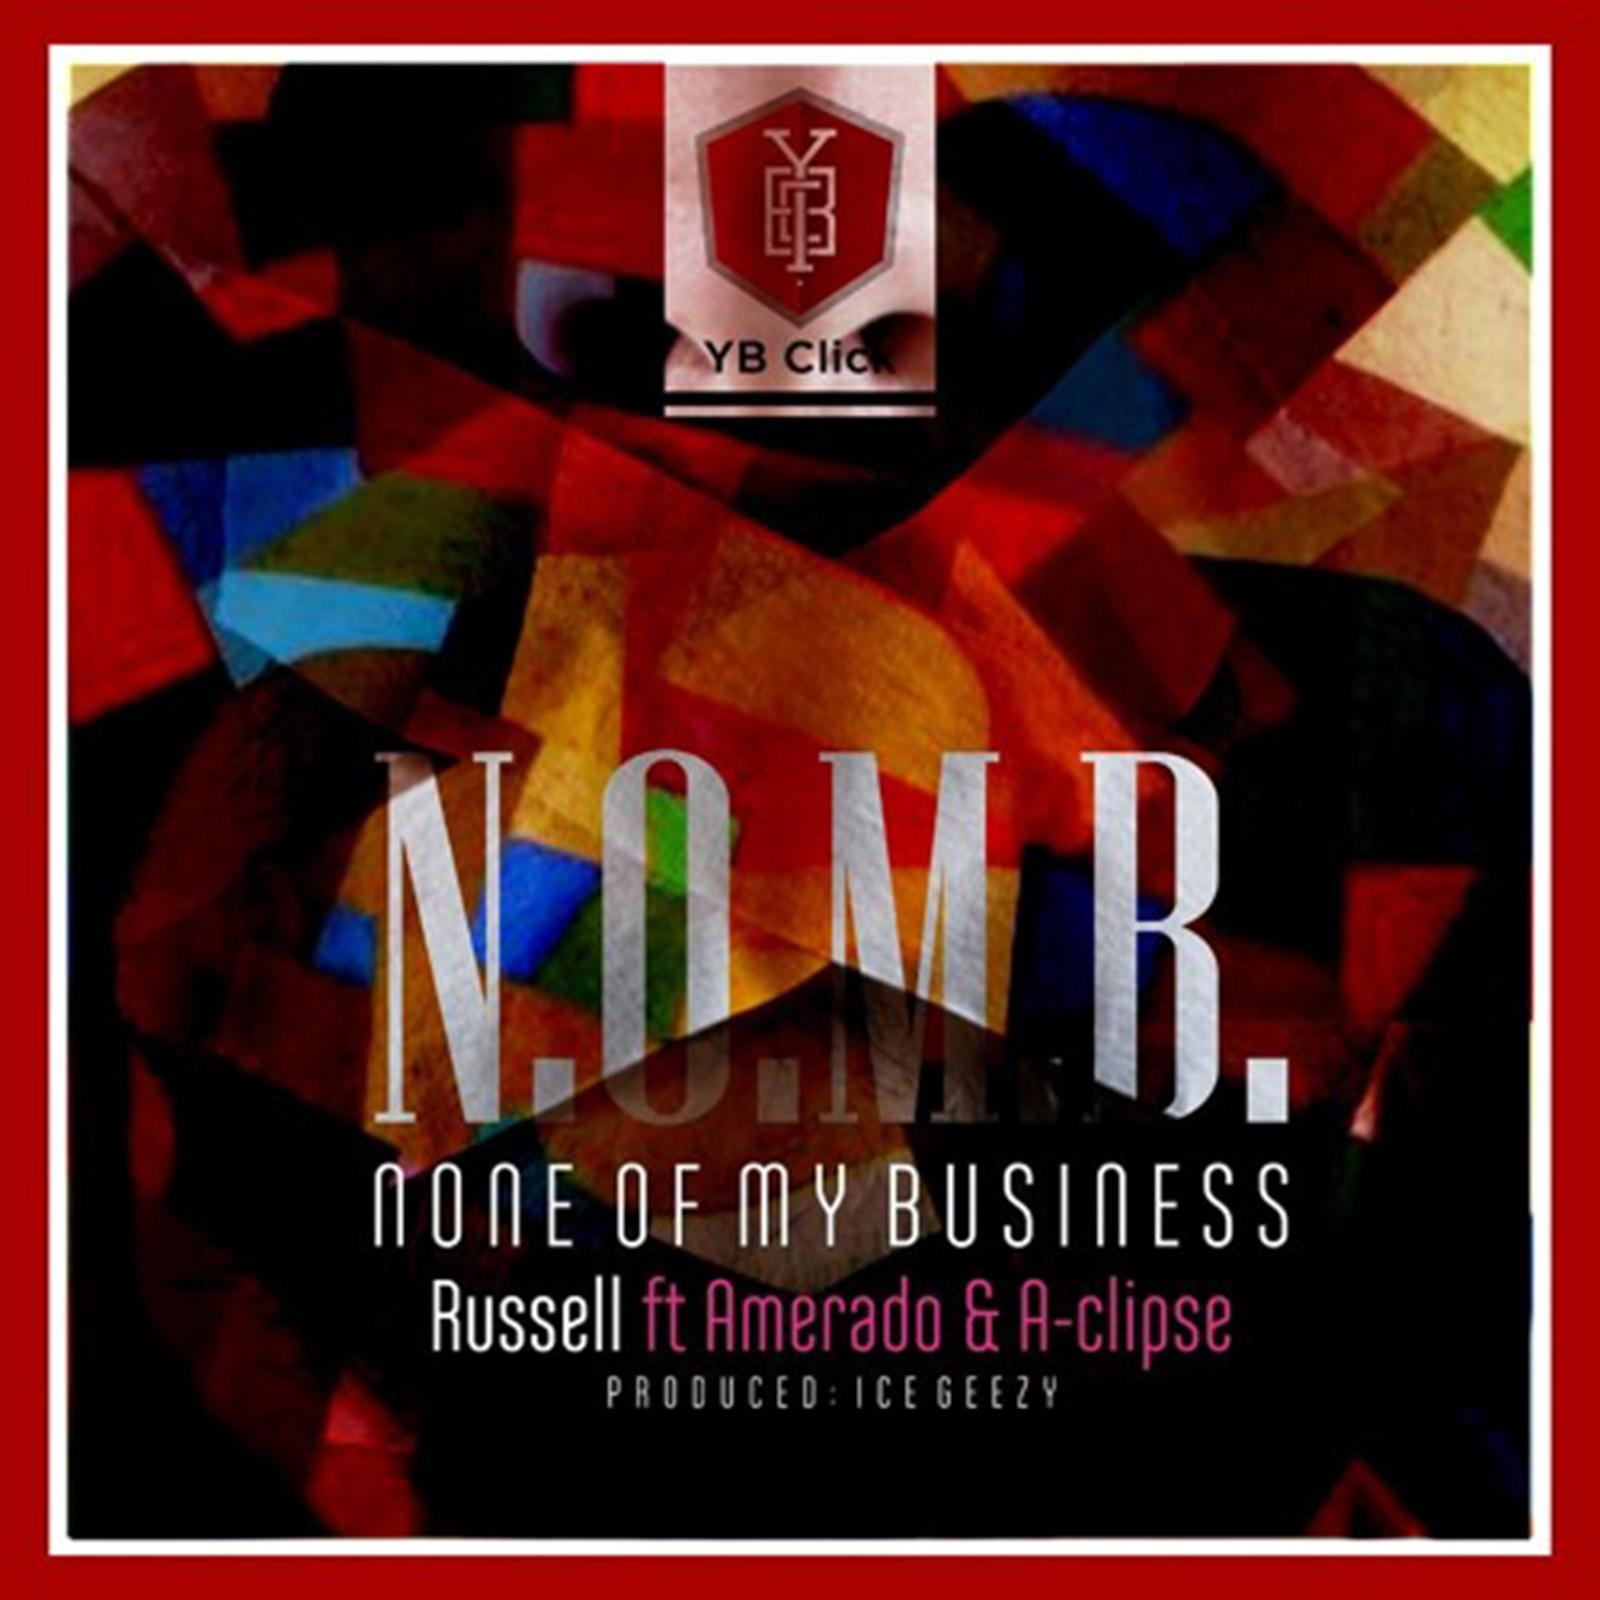 N.O.M.B. by Russell feat. Amerado & A-Clipse